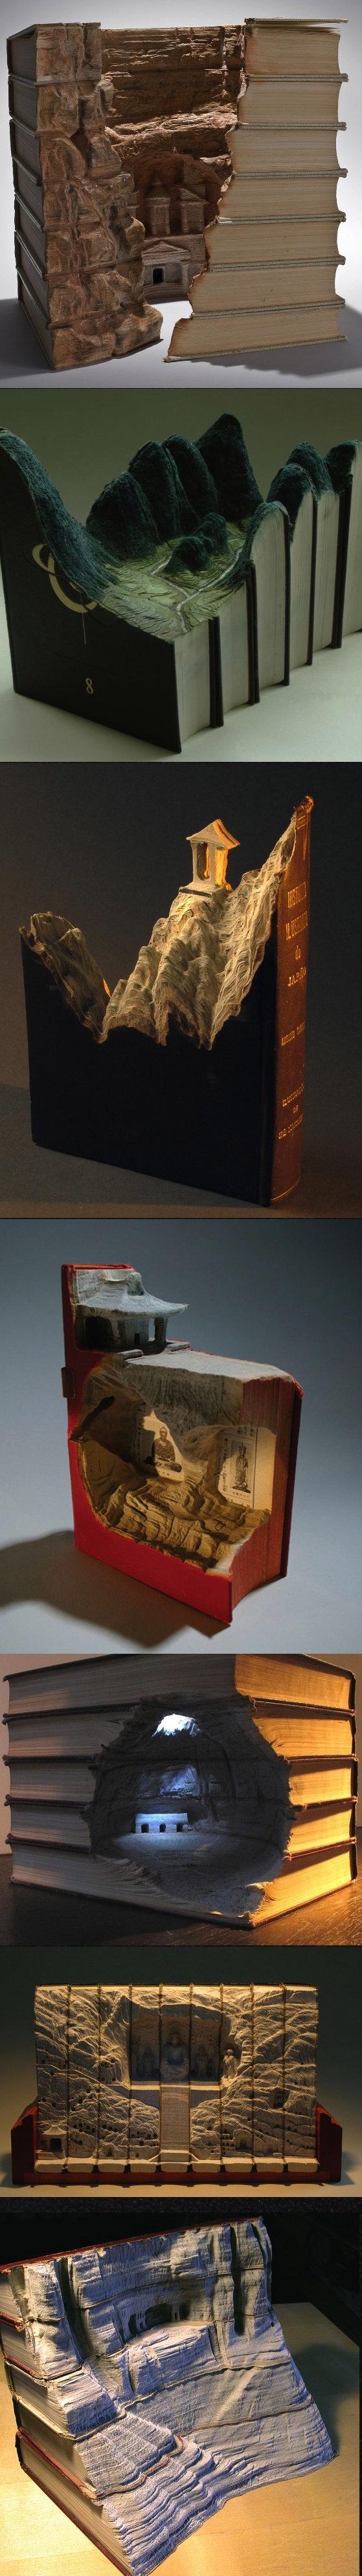 book art. .. My favorite. It's so beautiful!